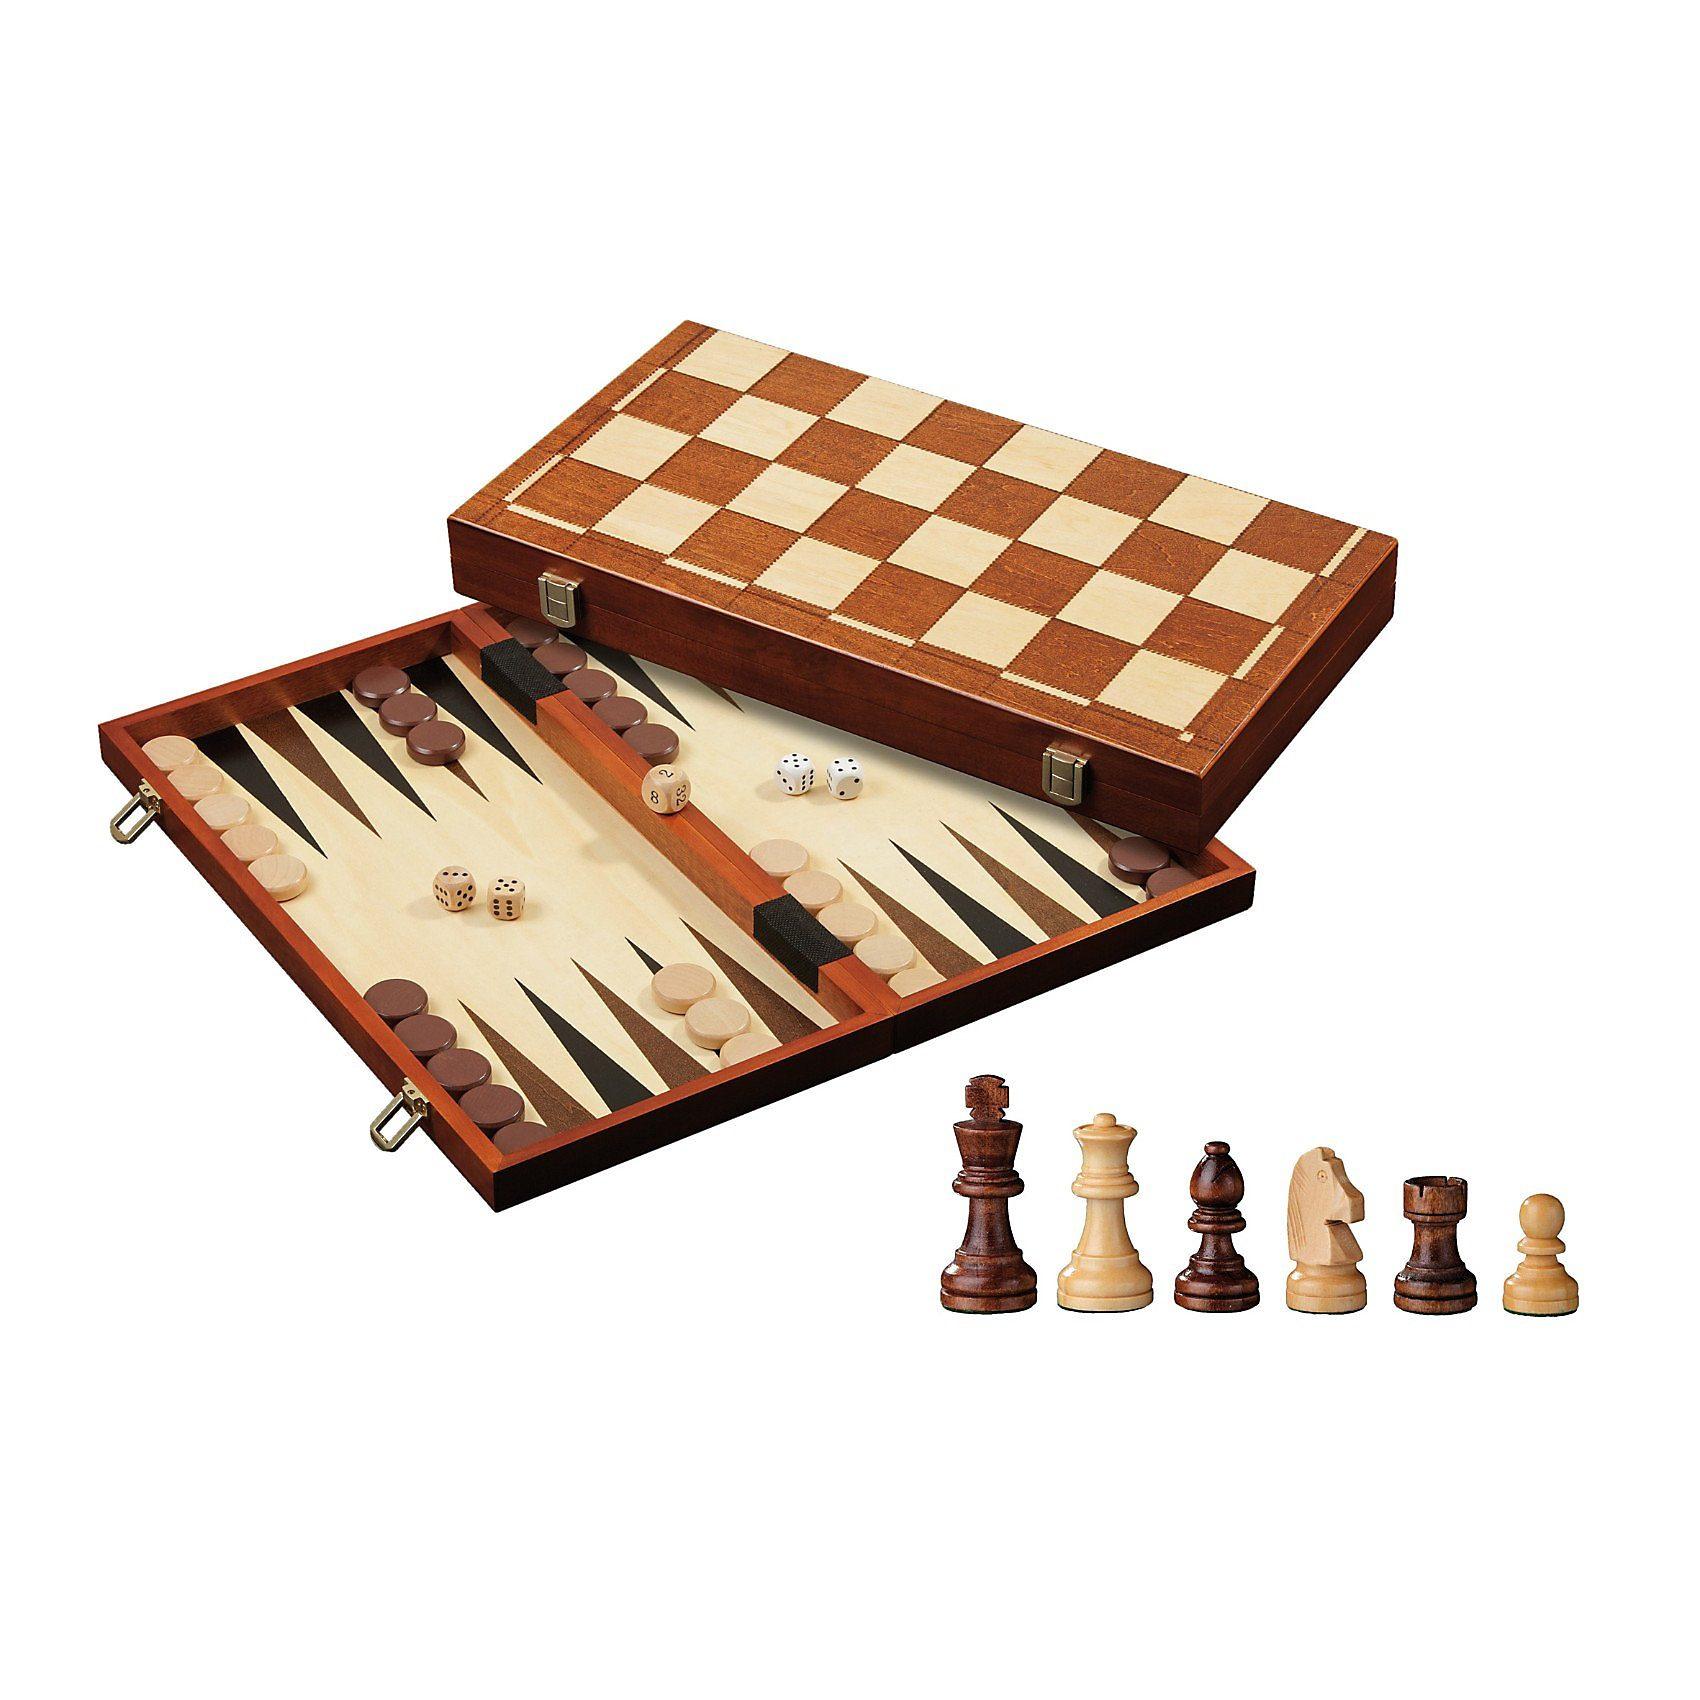 Philos Schach-Backgammon-Dame-Set, Feld 40 mm